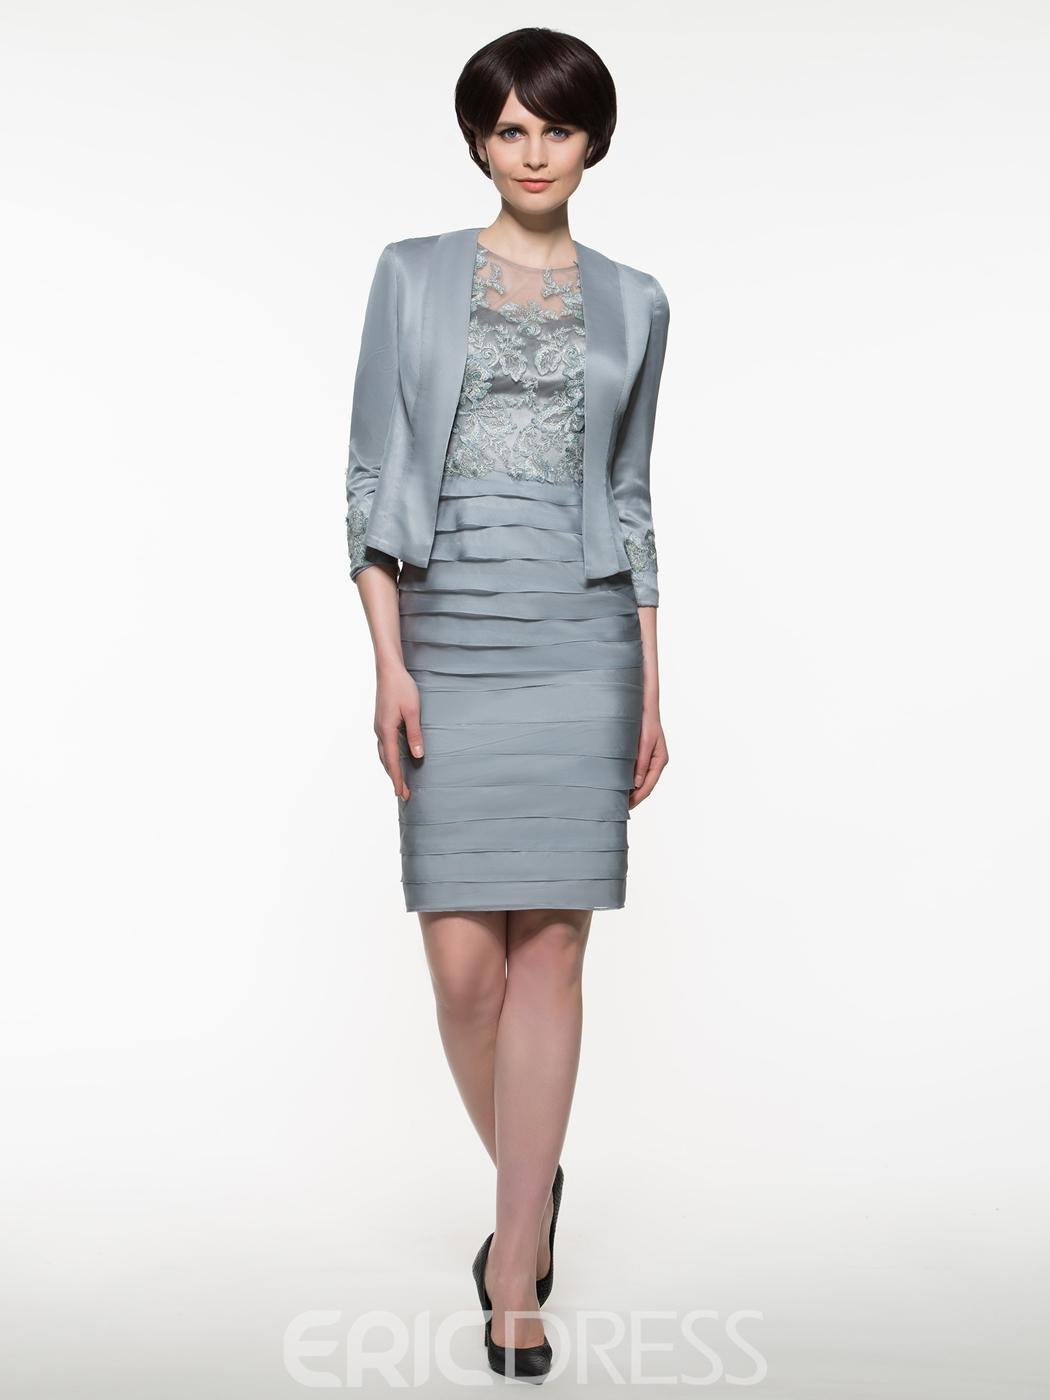 Luxury Mother Of The Groom Dresses Knee Length Vignette - All ...